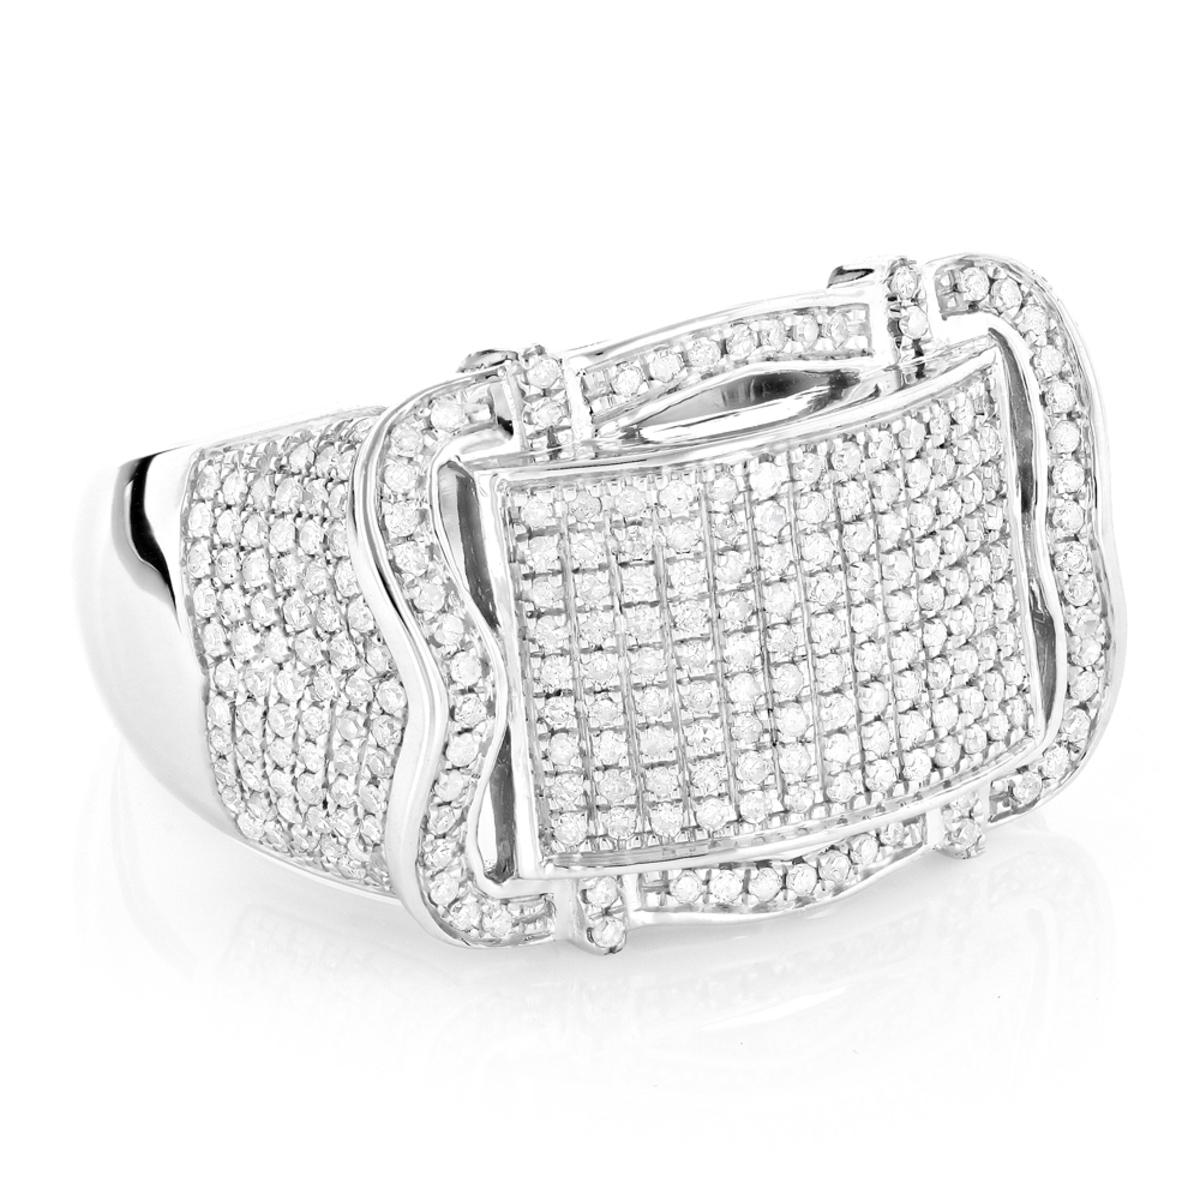 Pave Mens Diamond Ring 1ct 10K Gold